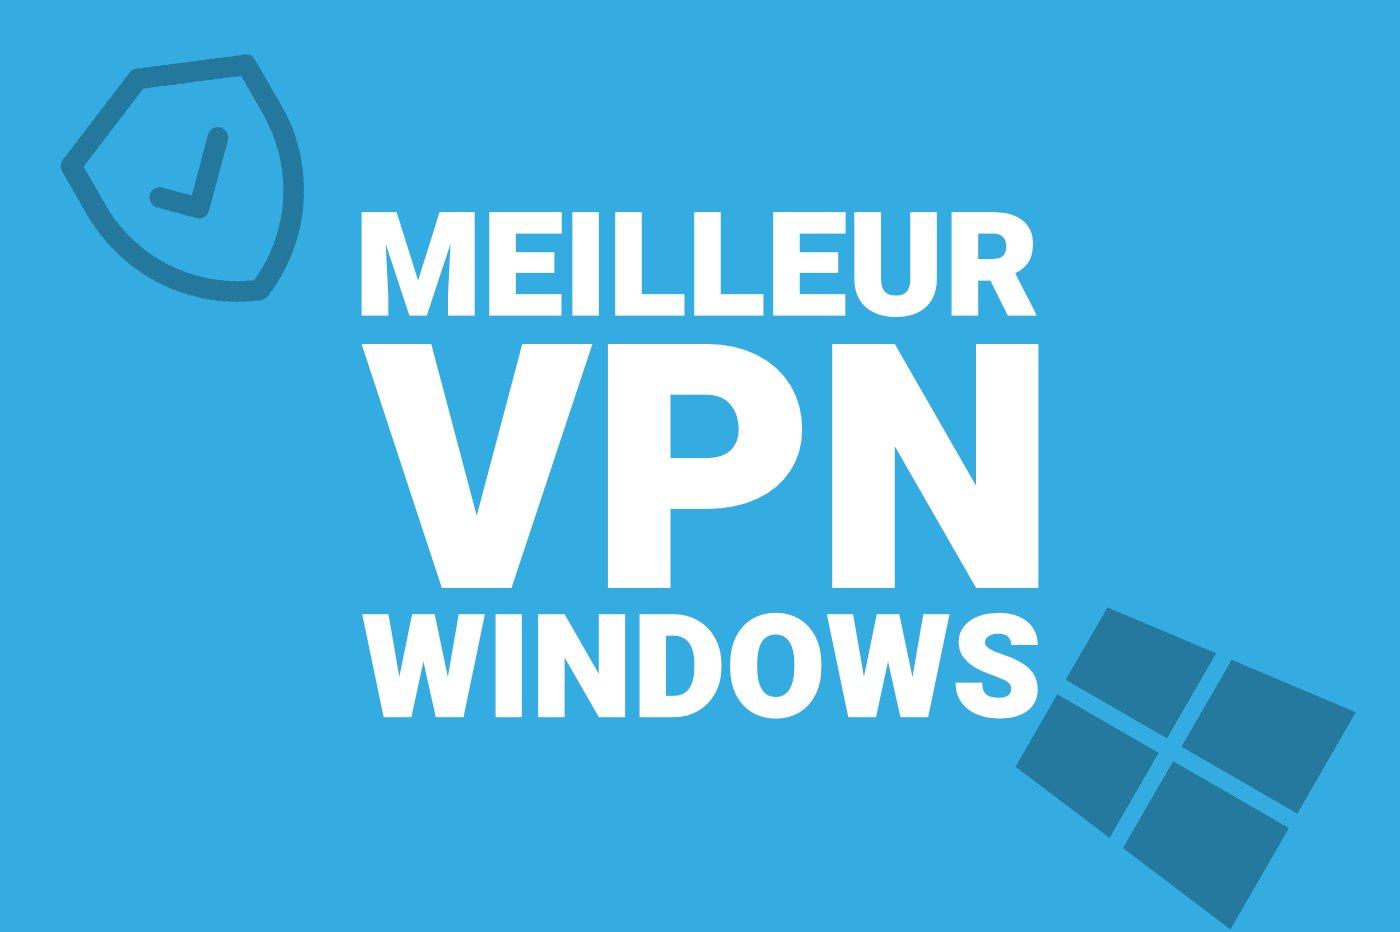 Meilleur VPN Windows